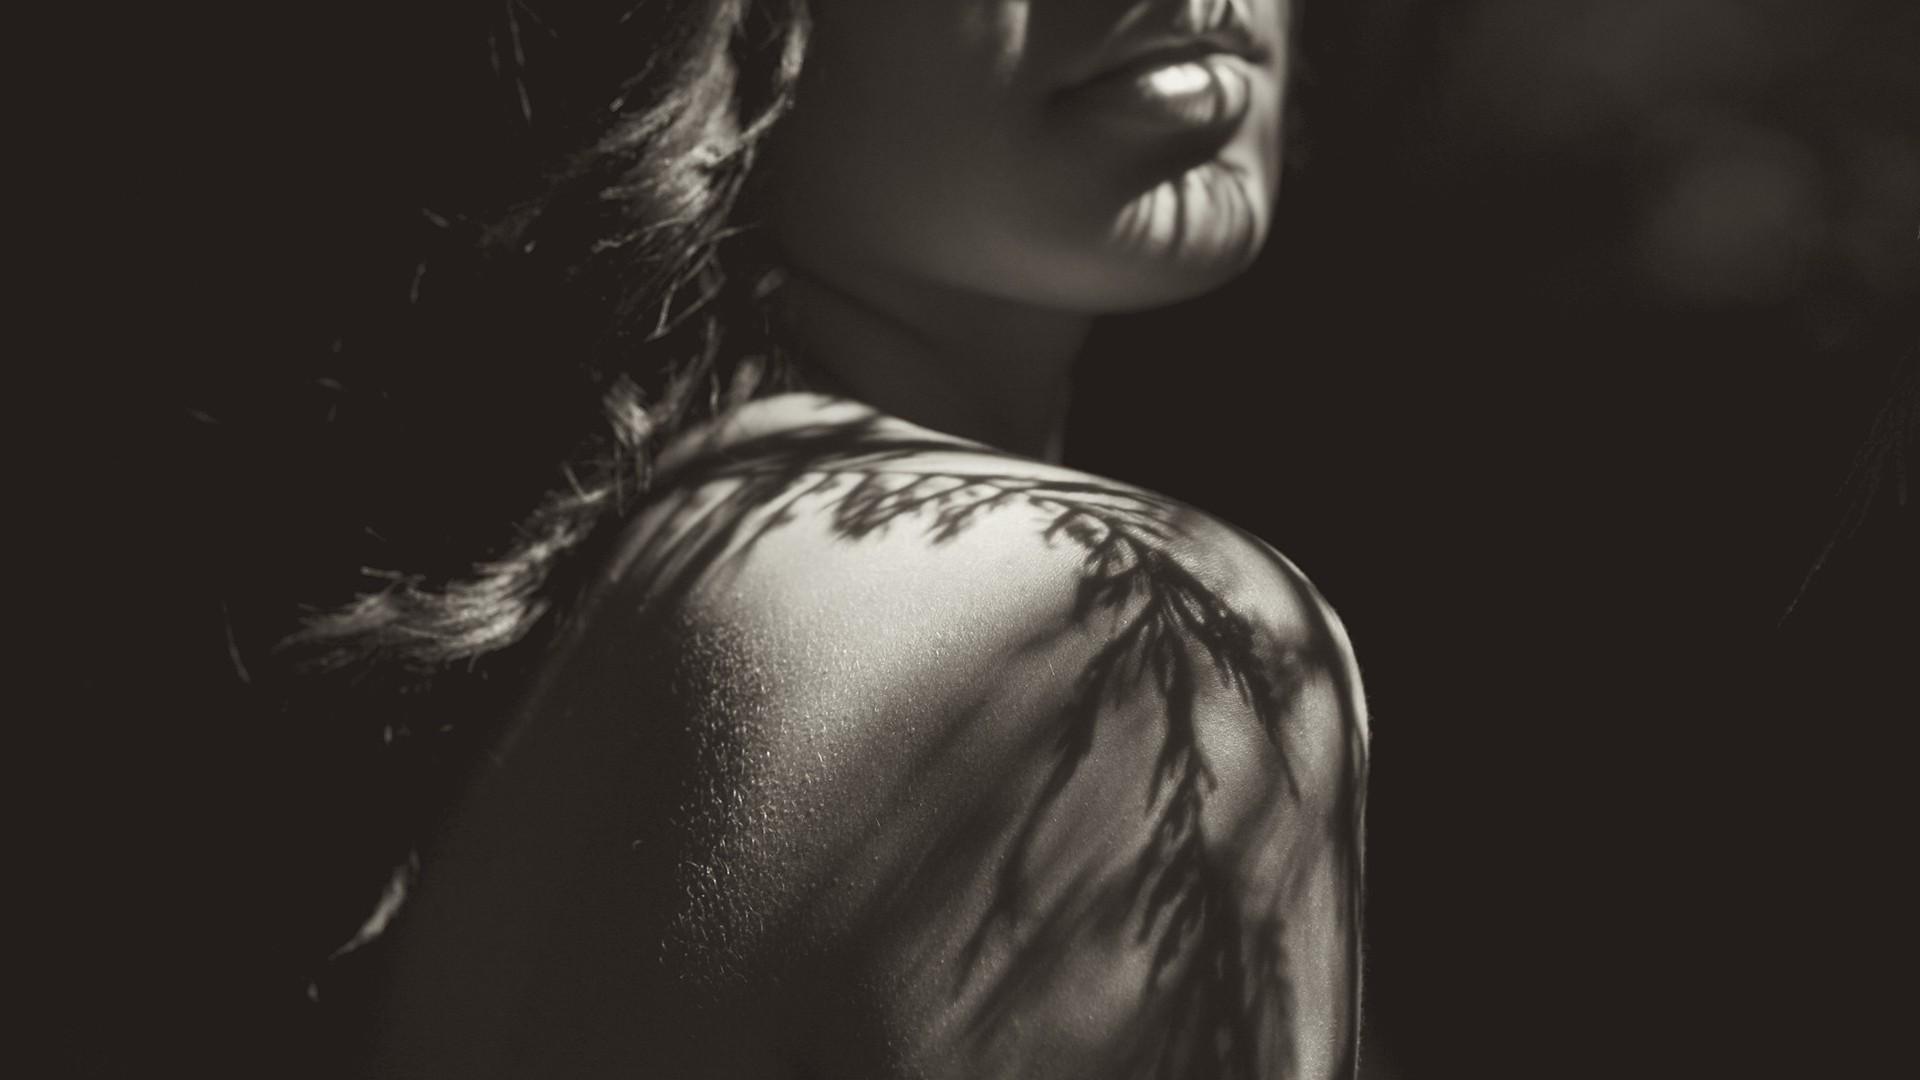 Girl Face Wallpaper 5k Women Monochrome Shadow Bare Shoulders Brunette Face